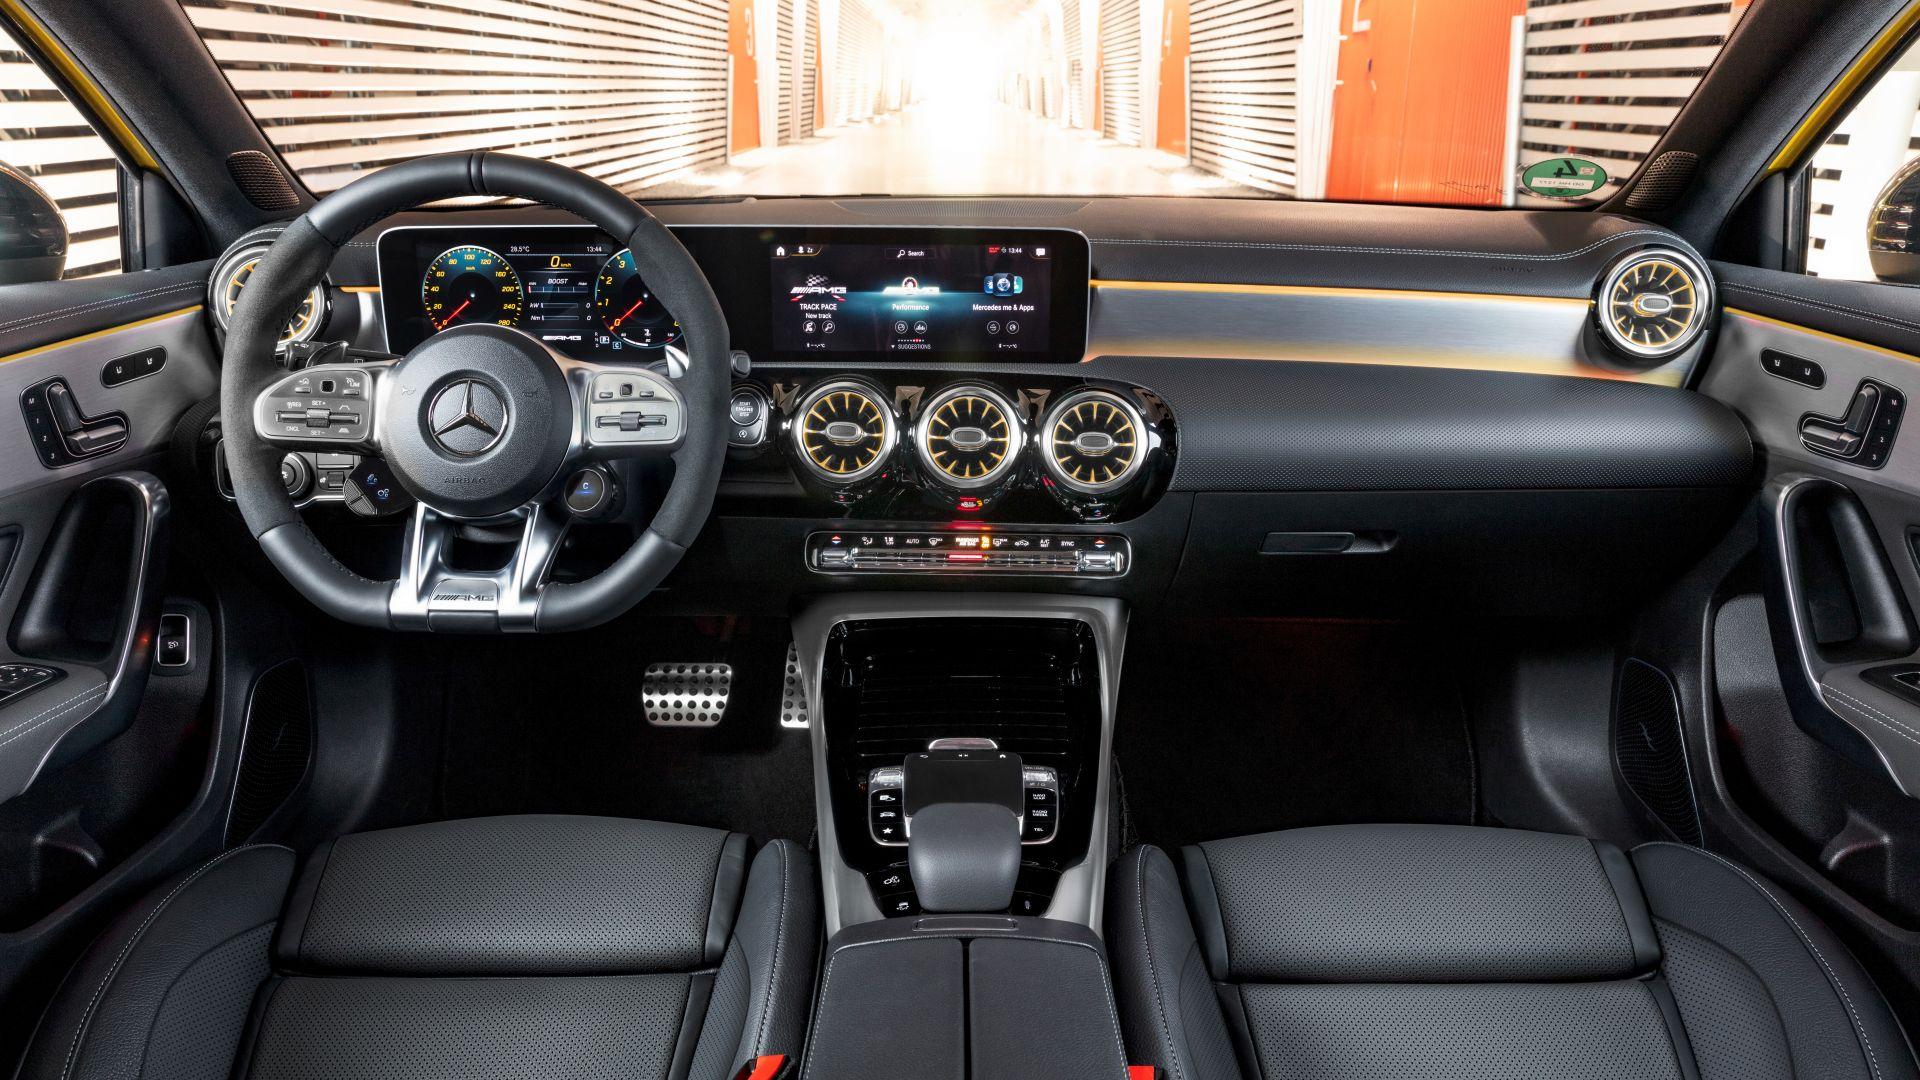 2018 Ford Raptor 4 Door >> Wallpaper Mercedes-Benz A35 AMG 4Matic, 2019 Cars, 8K, Cars & Bikes #20407